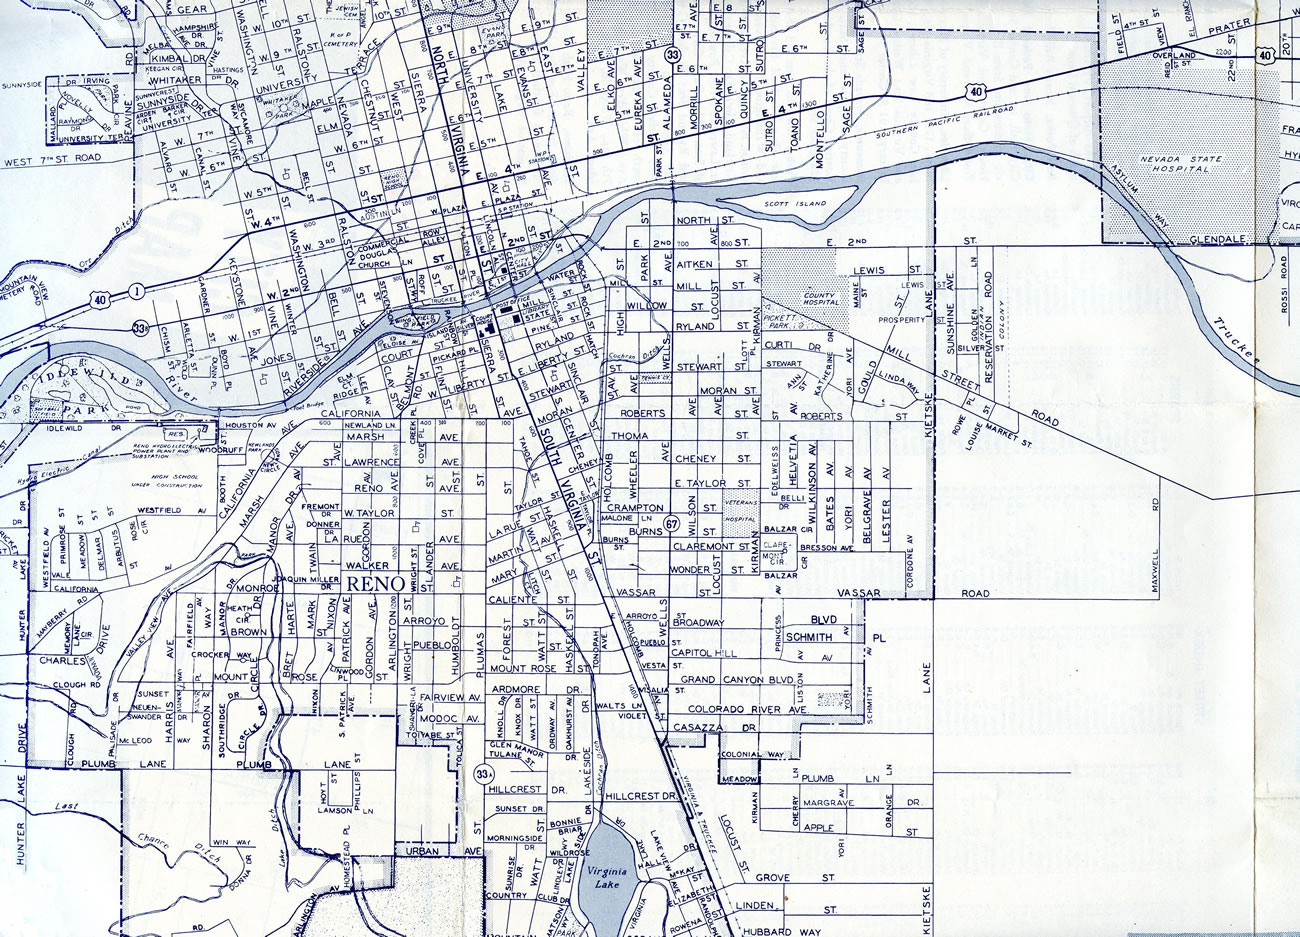 reno nevada street map Reno Sparks Aaroads reno nevada street map